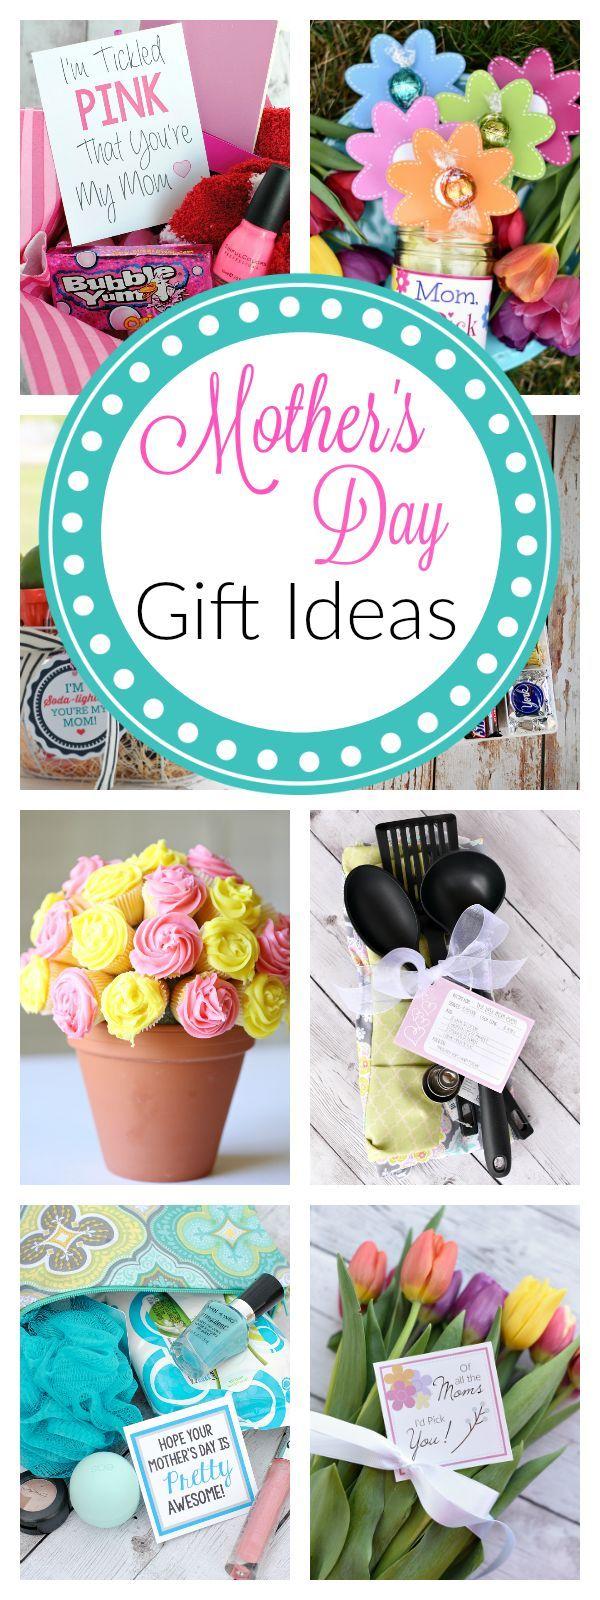 434 best handmade gift ideas images on pinterest gifts homemade